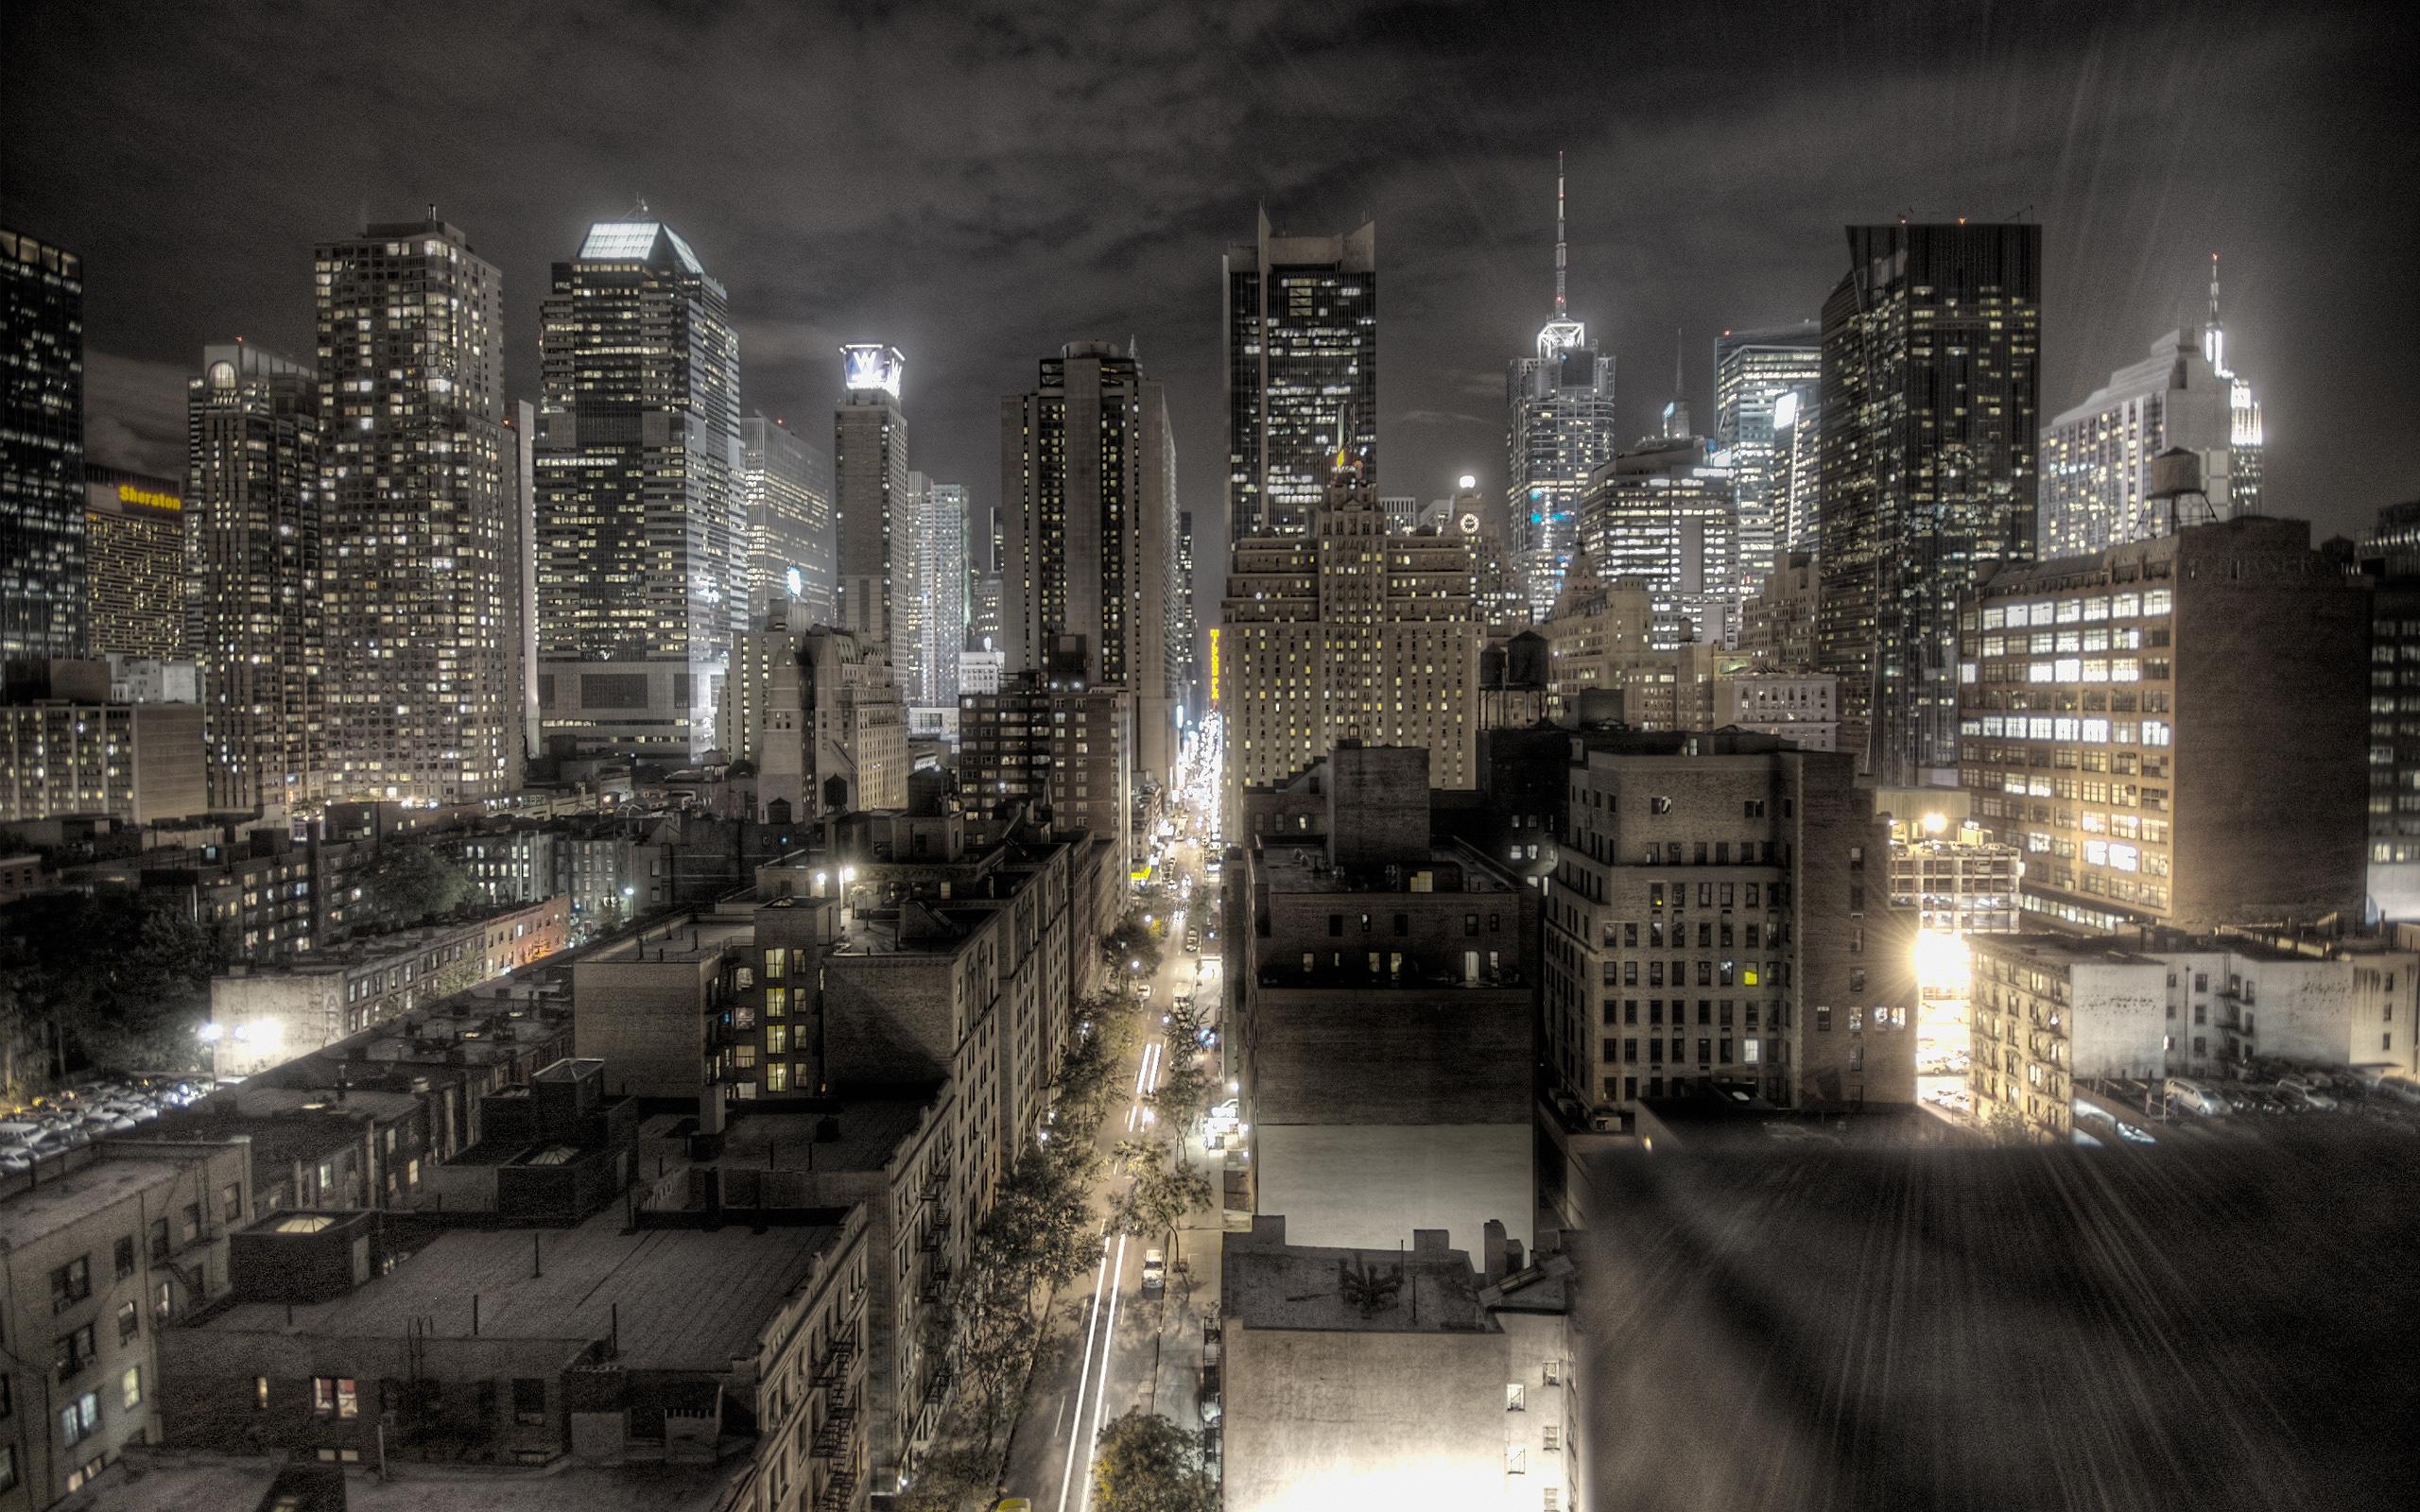 Dark Newyork city Wallpapers HD Wallpapers 2560x1600